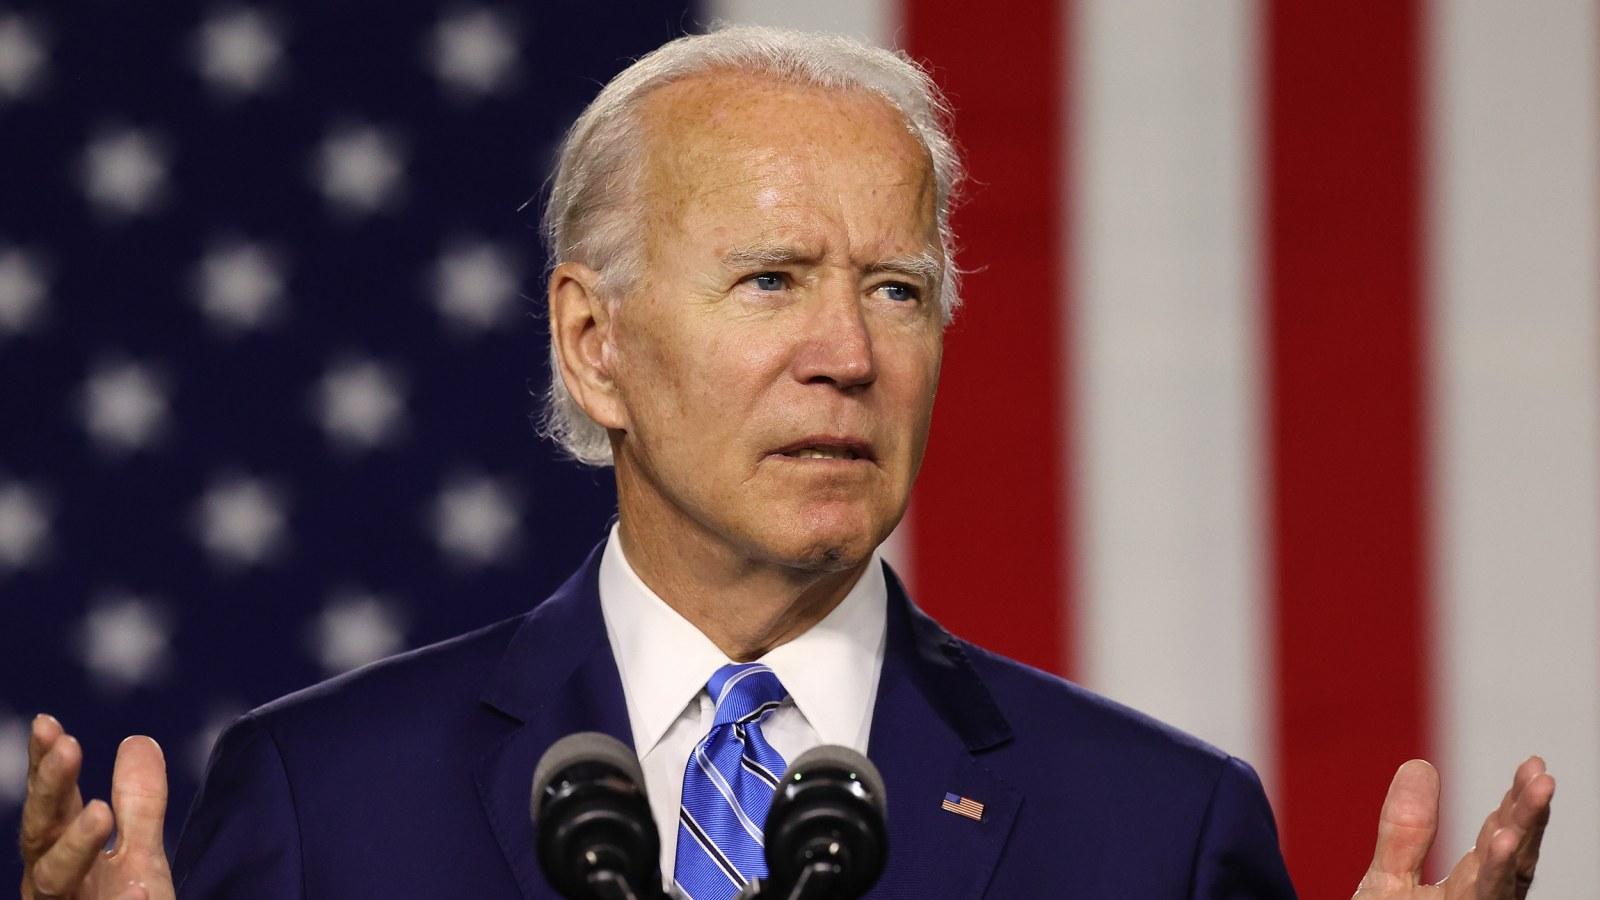 Biden plagiarized speech